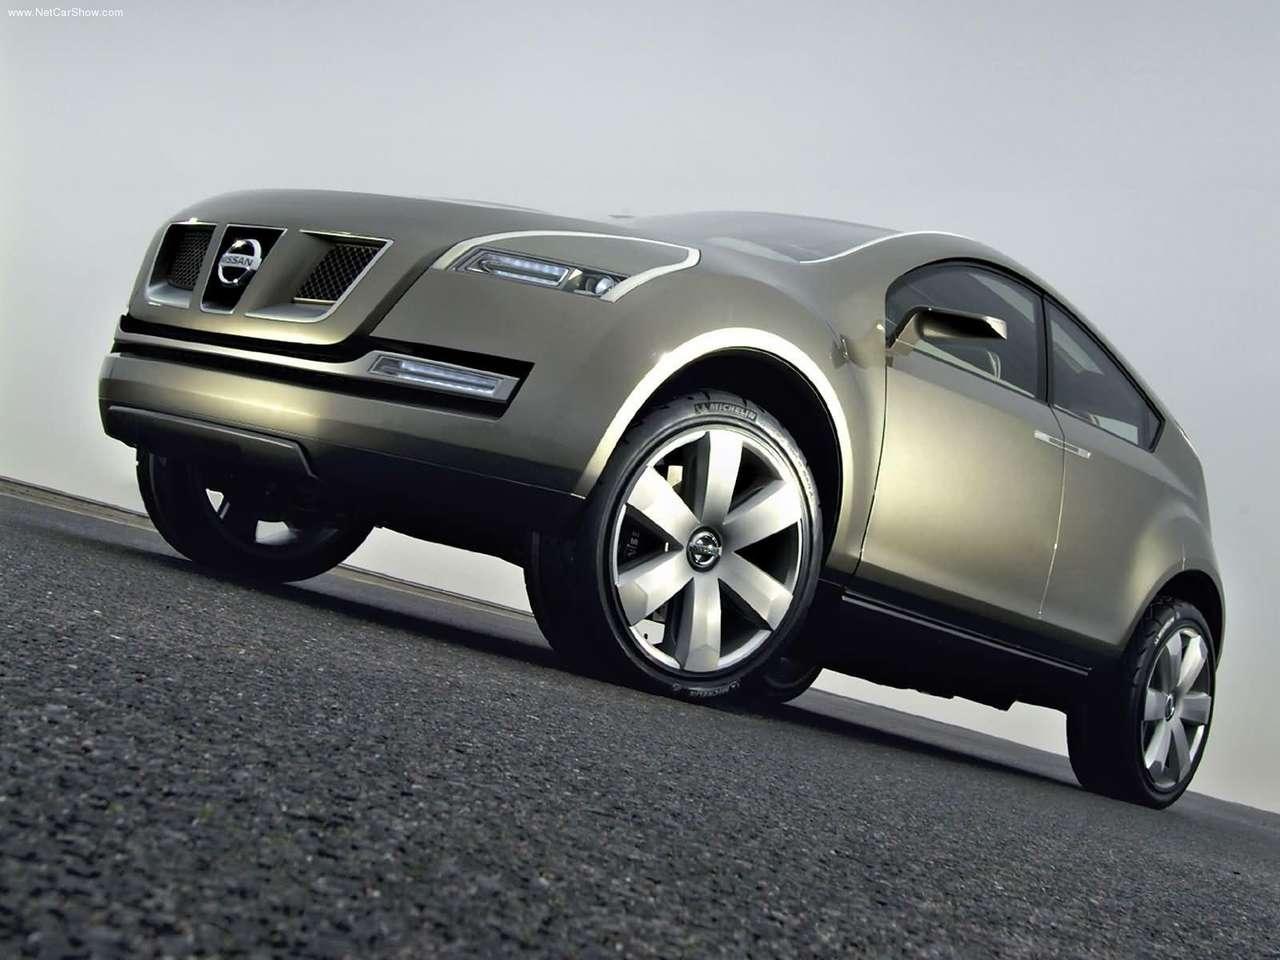 http://2.bp.blogspot.com/-asRsiBH89vs/TXtK3NRYVpI/AAAAAAAAFdI/g_Konl9hTQE/s1600/Nissan-Qashqai_Concept_2004_1280x960_wallpaper_01.jpg